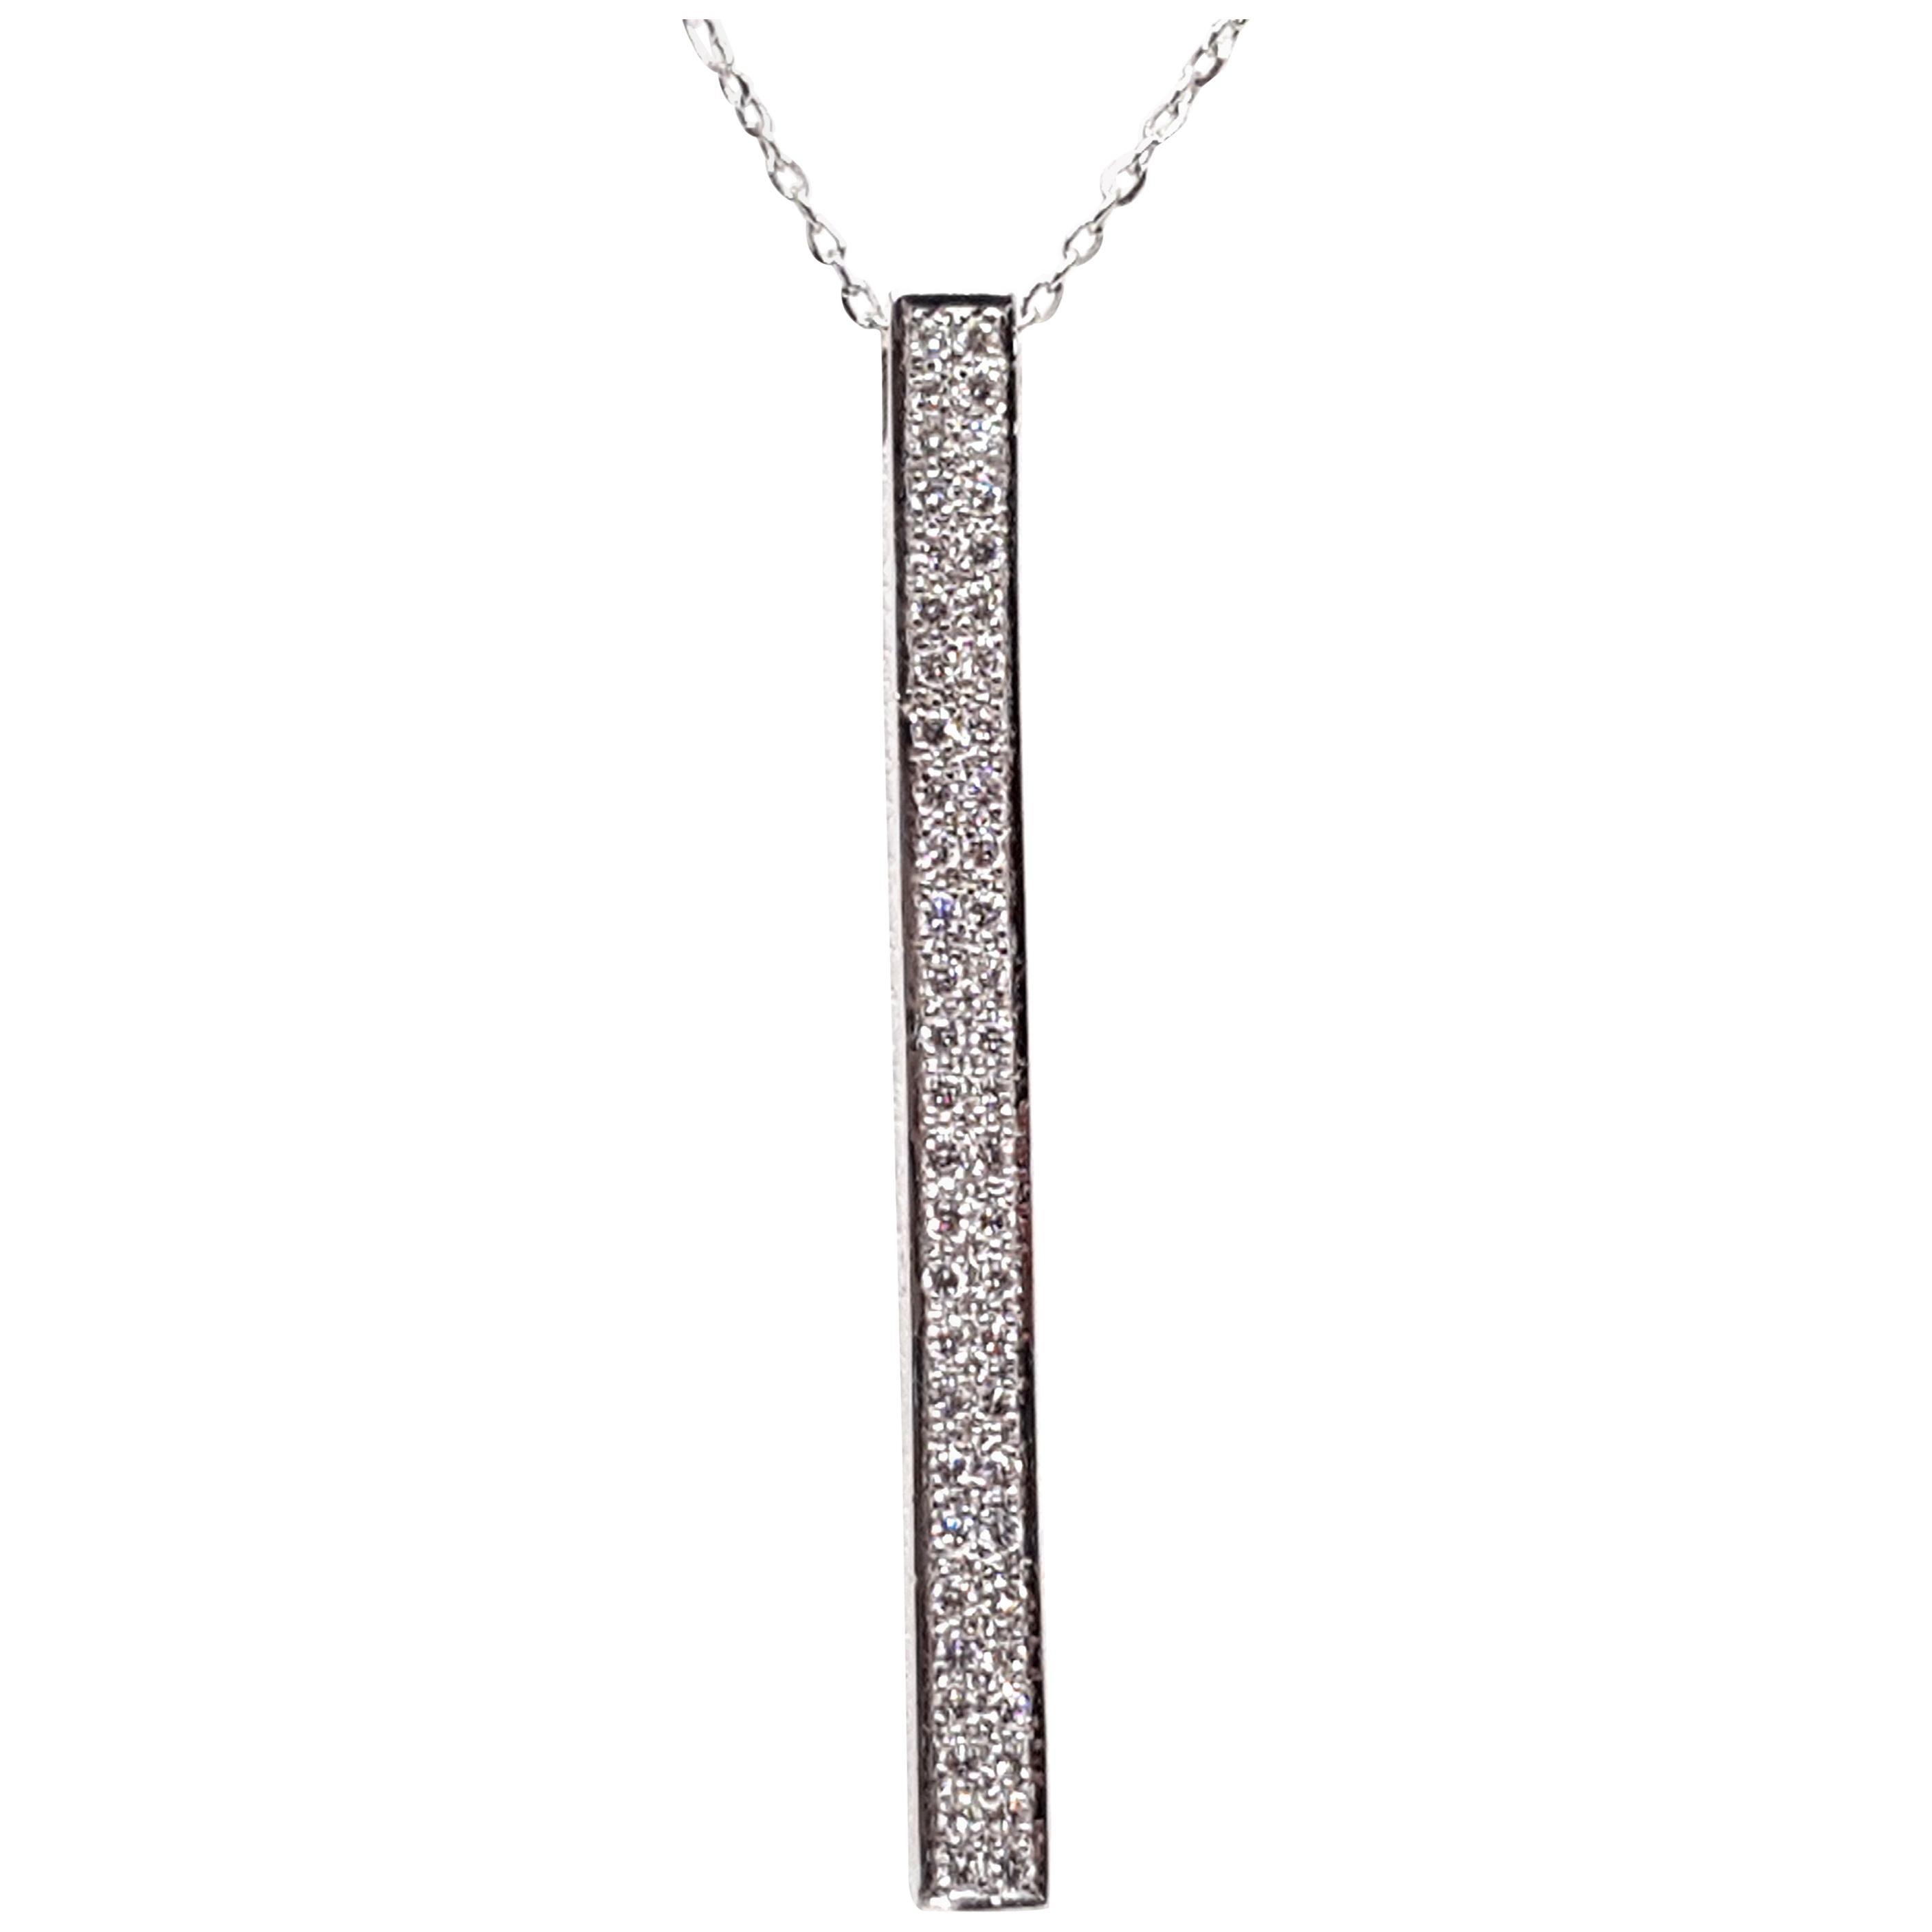 0.77 Carat White Gold Necklace Diamond Pendant